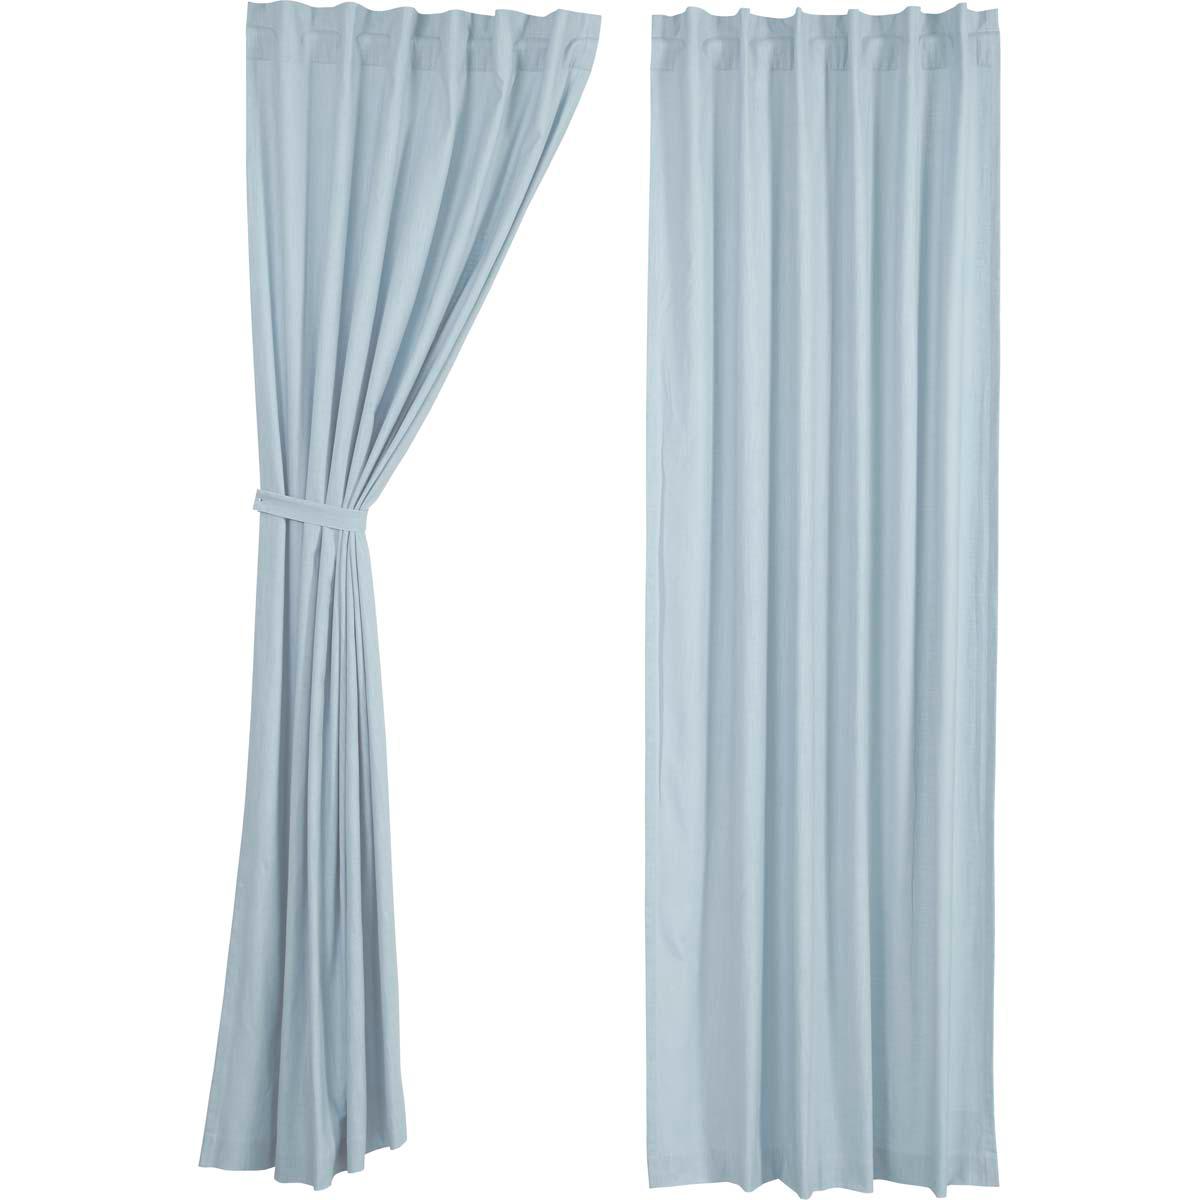 Regina Light Blue Panel Curtains 108x55 Romanblindsandcurtains Light Blue Curtains Blue Panels Baby Blue Curtains